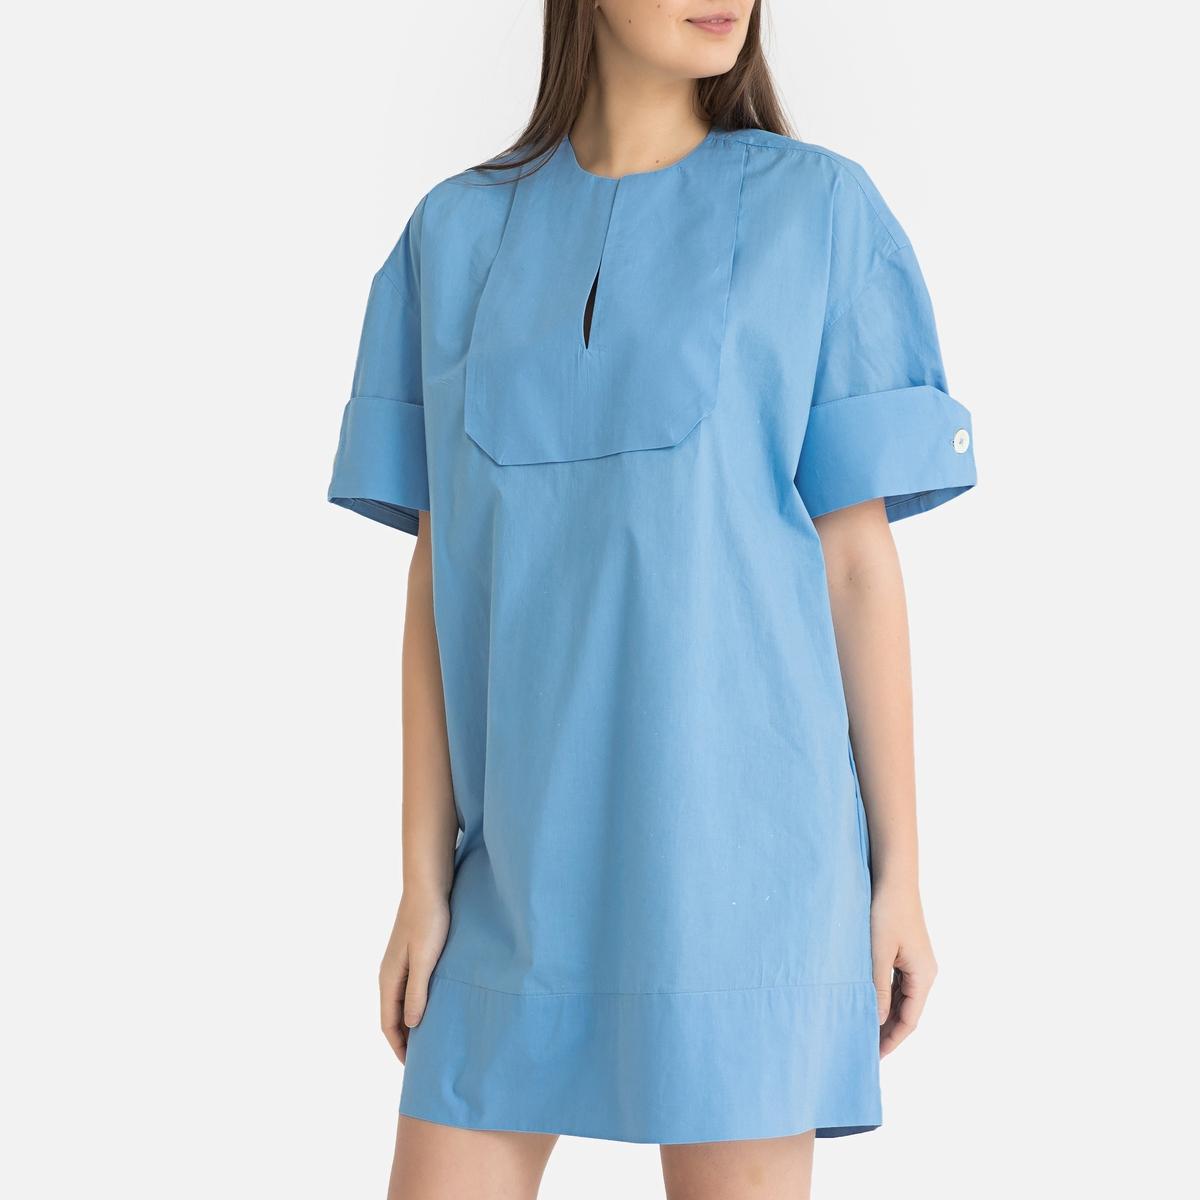 Платье LaRedoute Свободного покроя с короткими рукавами 2(M) синий